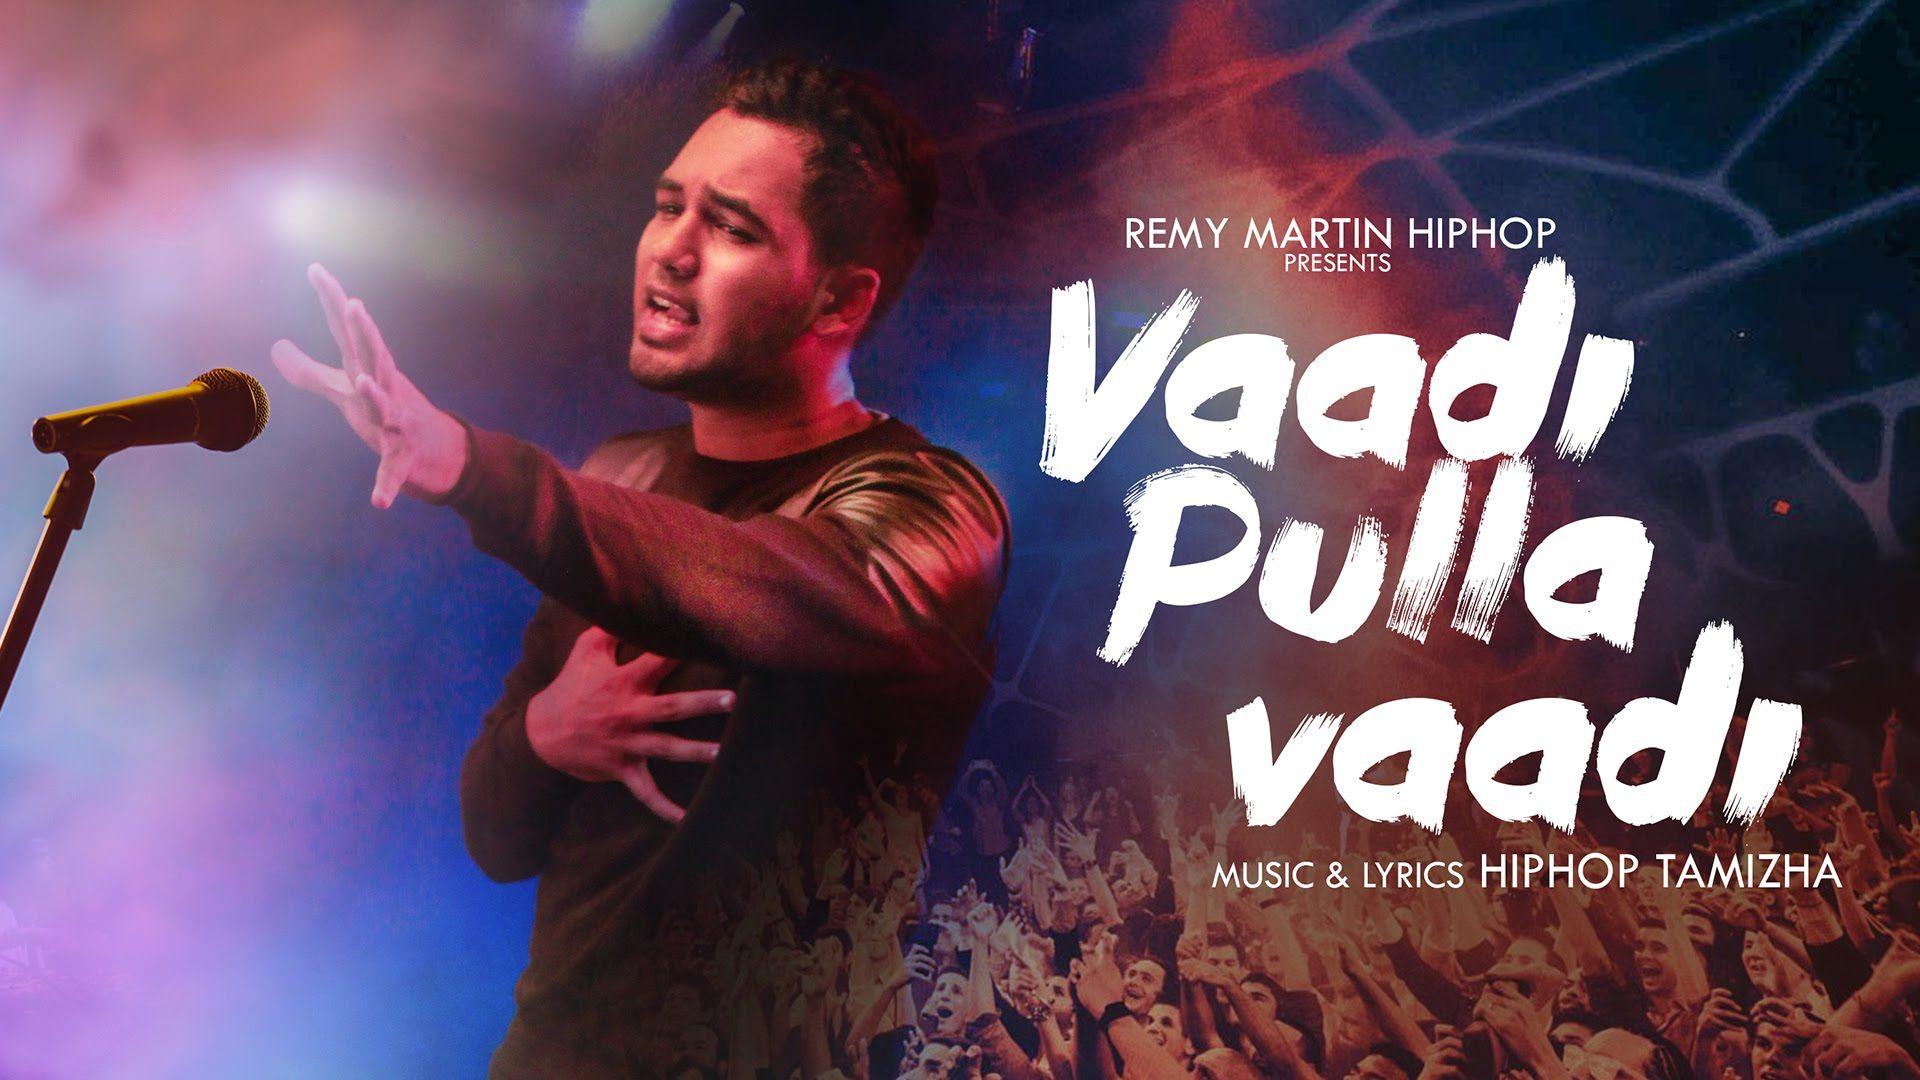 Hiphop Tamizha Vaadi Pulla Vaadi Official Music Video Youtube Videos Music Music Videos Album Songs